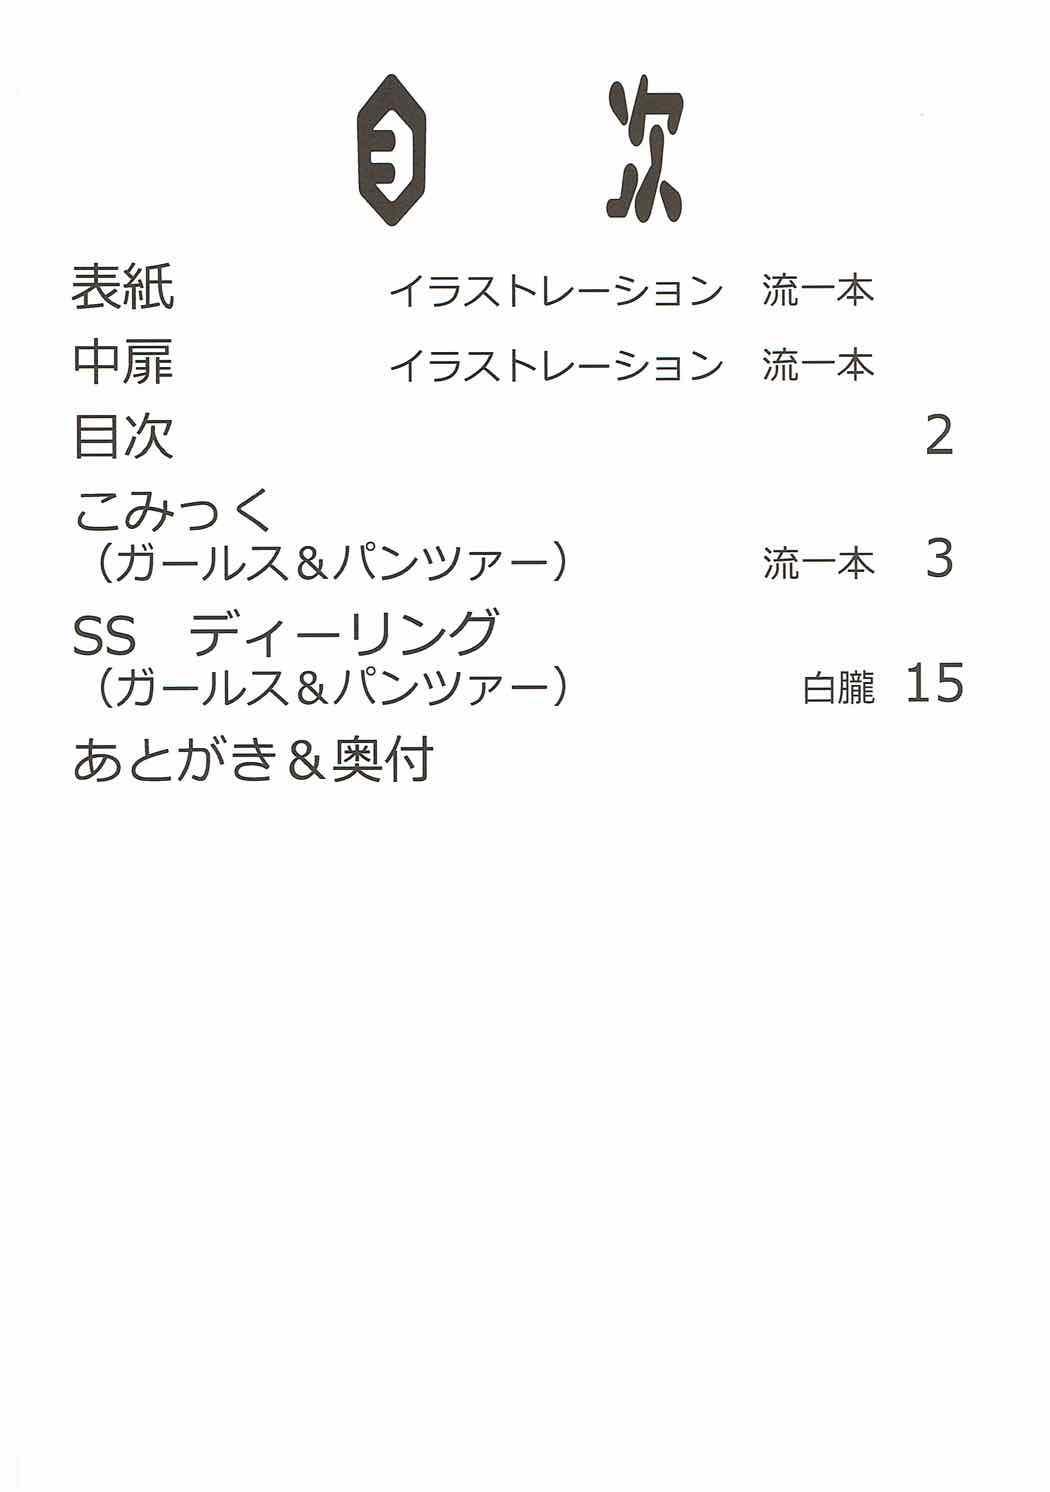 LeLe Pappa Vol. 31 Fukigenna Pasta 2